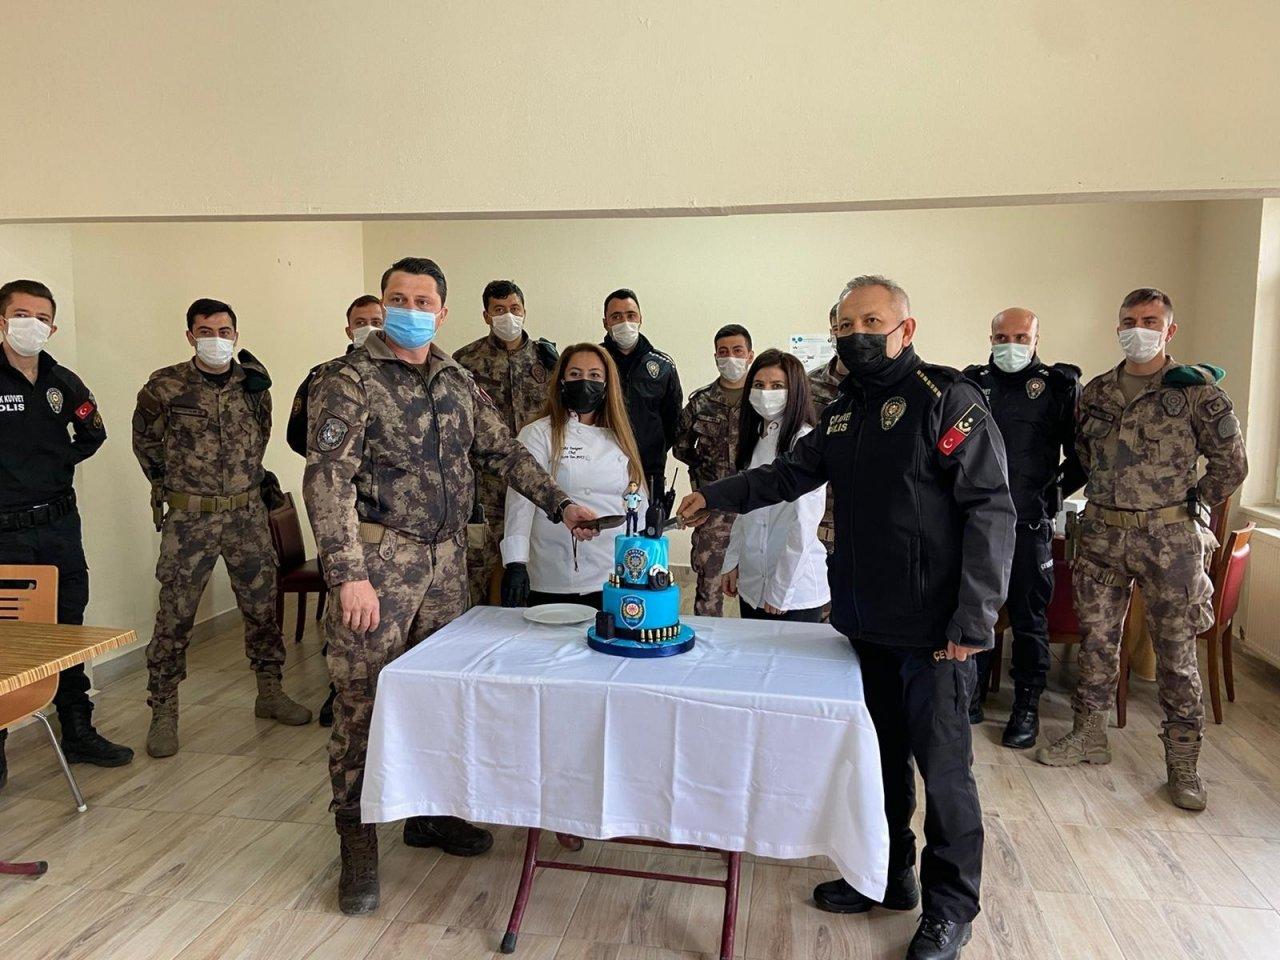 Afyonkarahisar'da Polislere Pasta Sürprizi